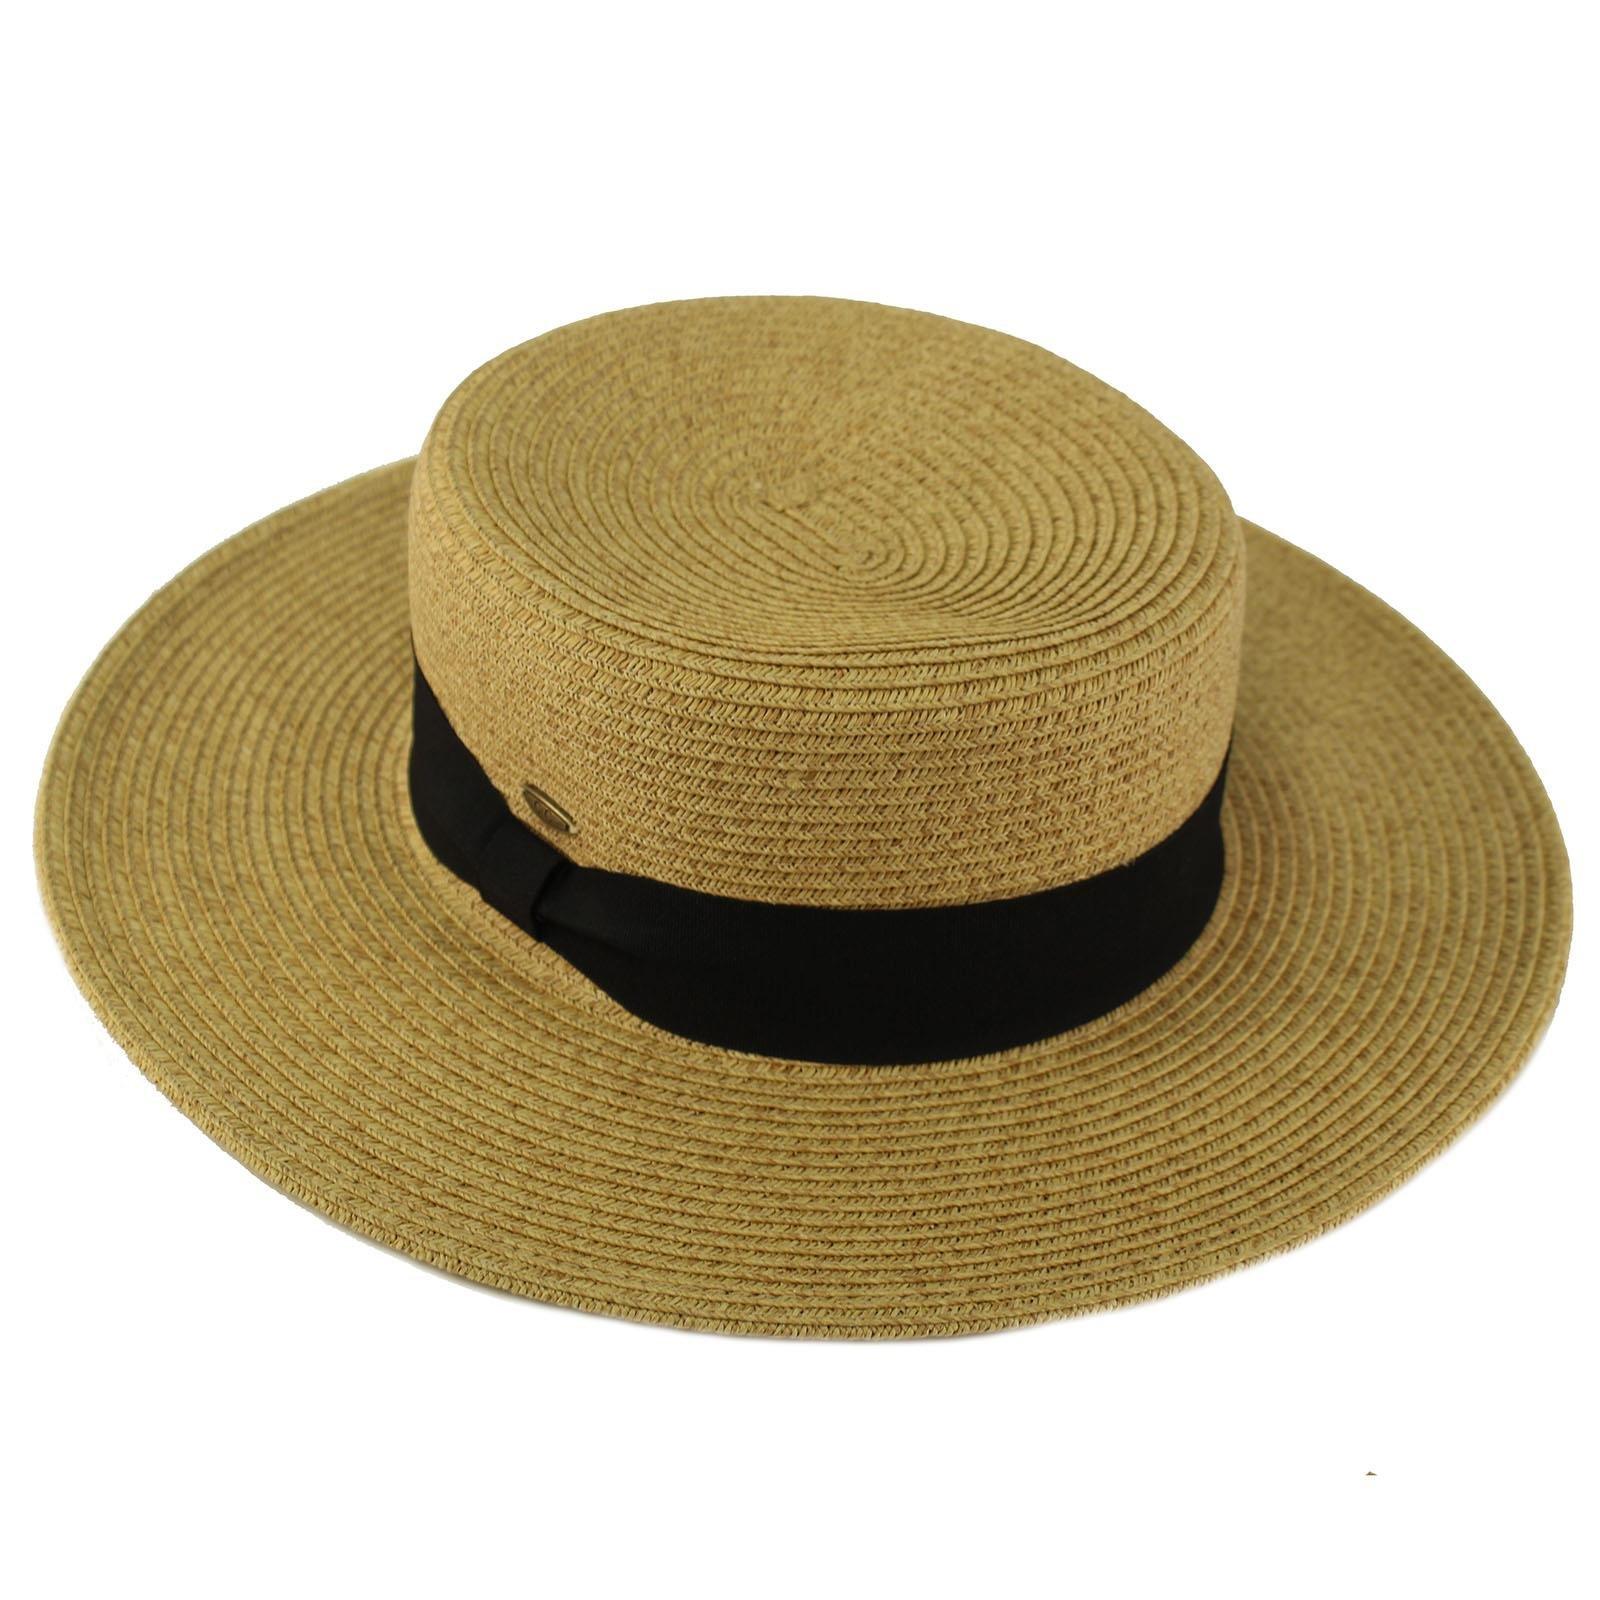 C.C Unisex Grosgrain Band Wide Porkpie Boater Derby Flat Top Fedora Sun Hat Toast/Black